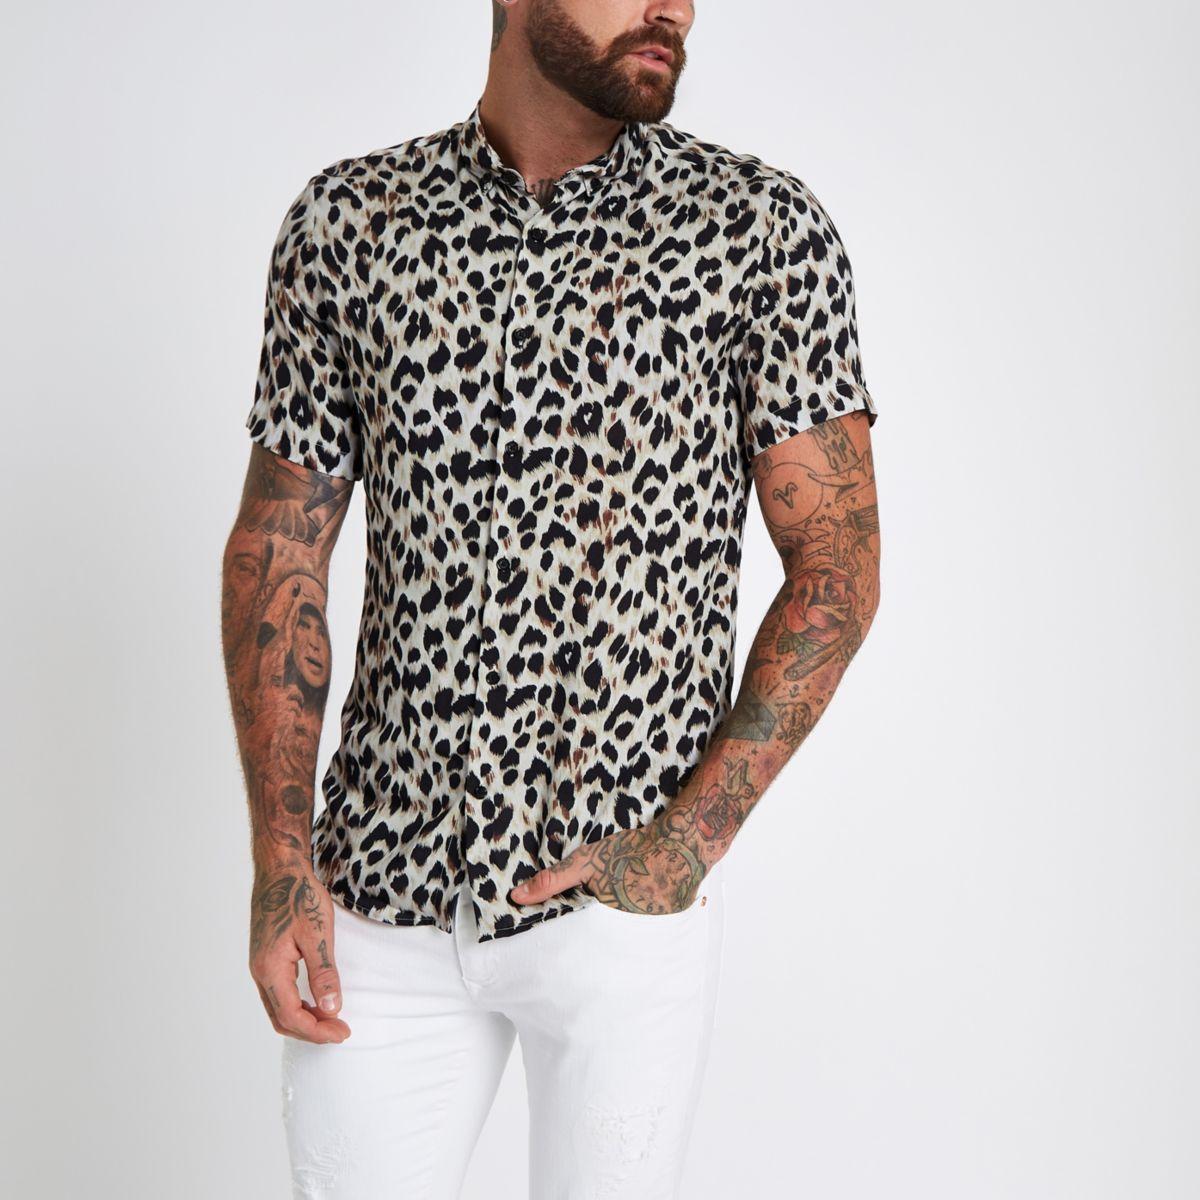 Grey leopard print revere slim fit shirt